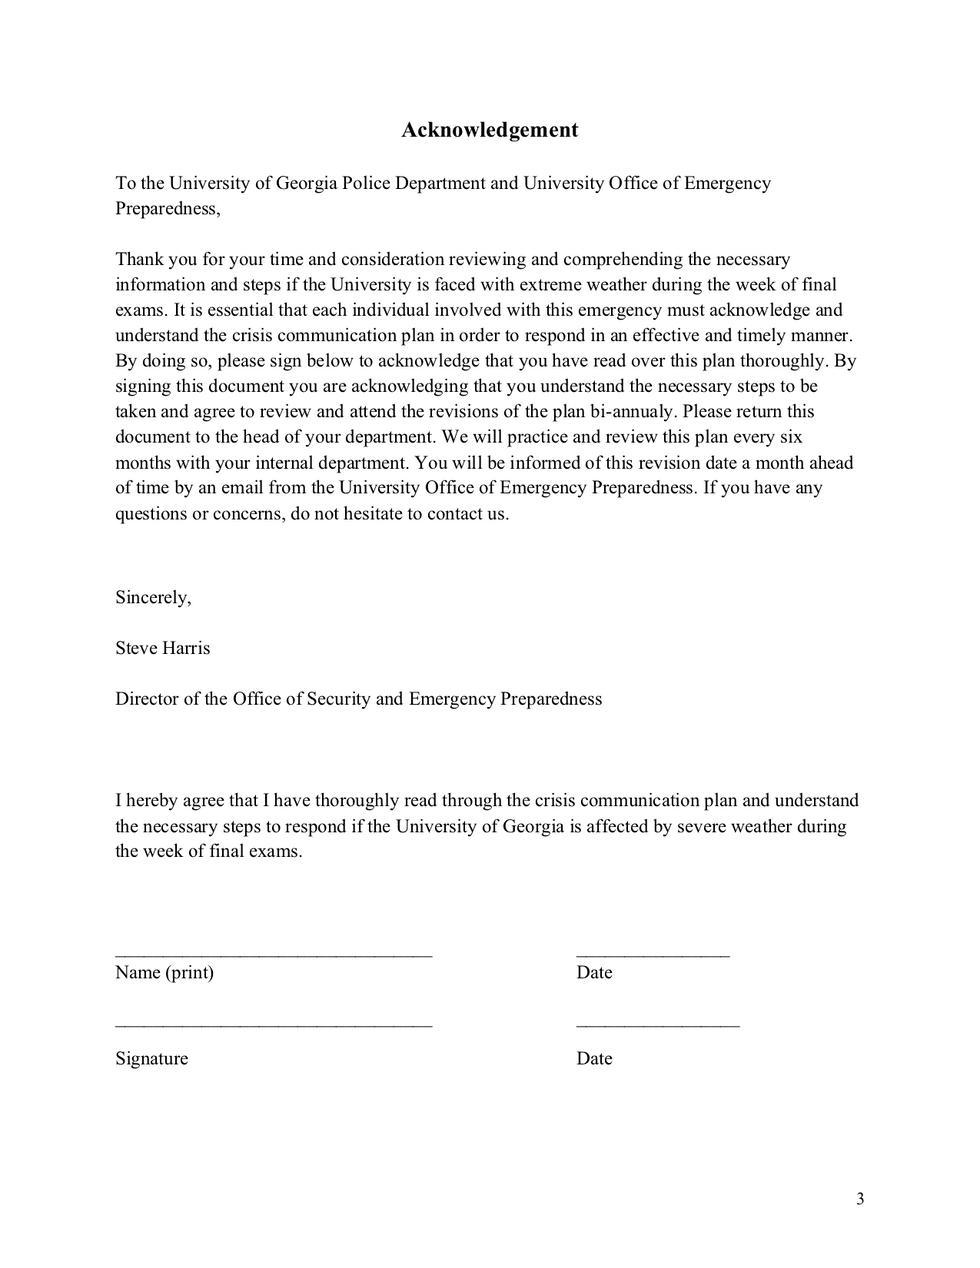 Crisis Communication Plan (dragged) 4.pn